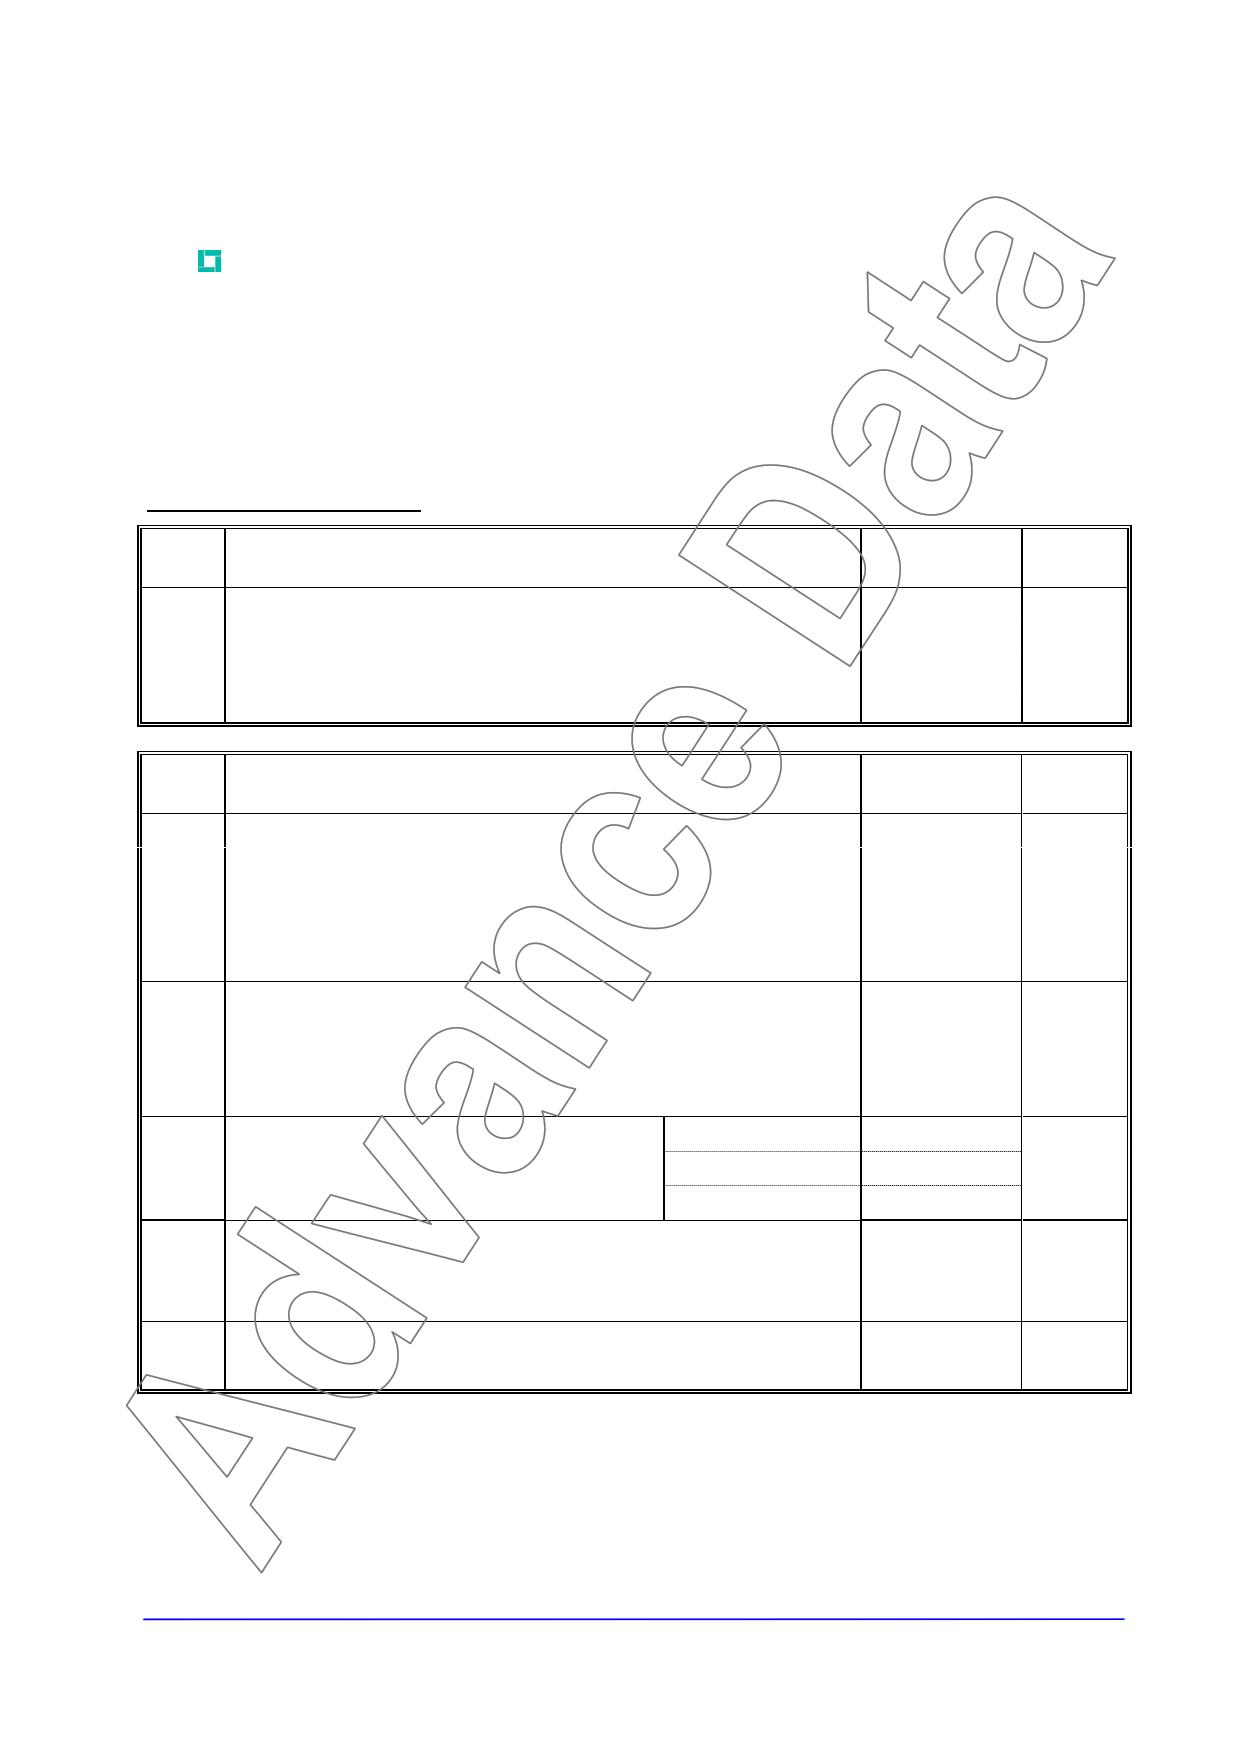 K0620QE650 datasheet